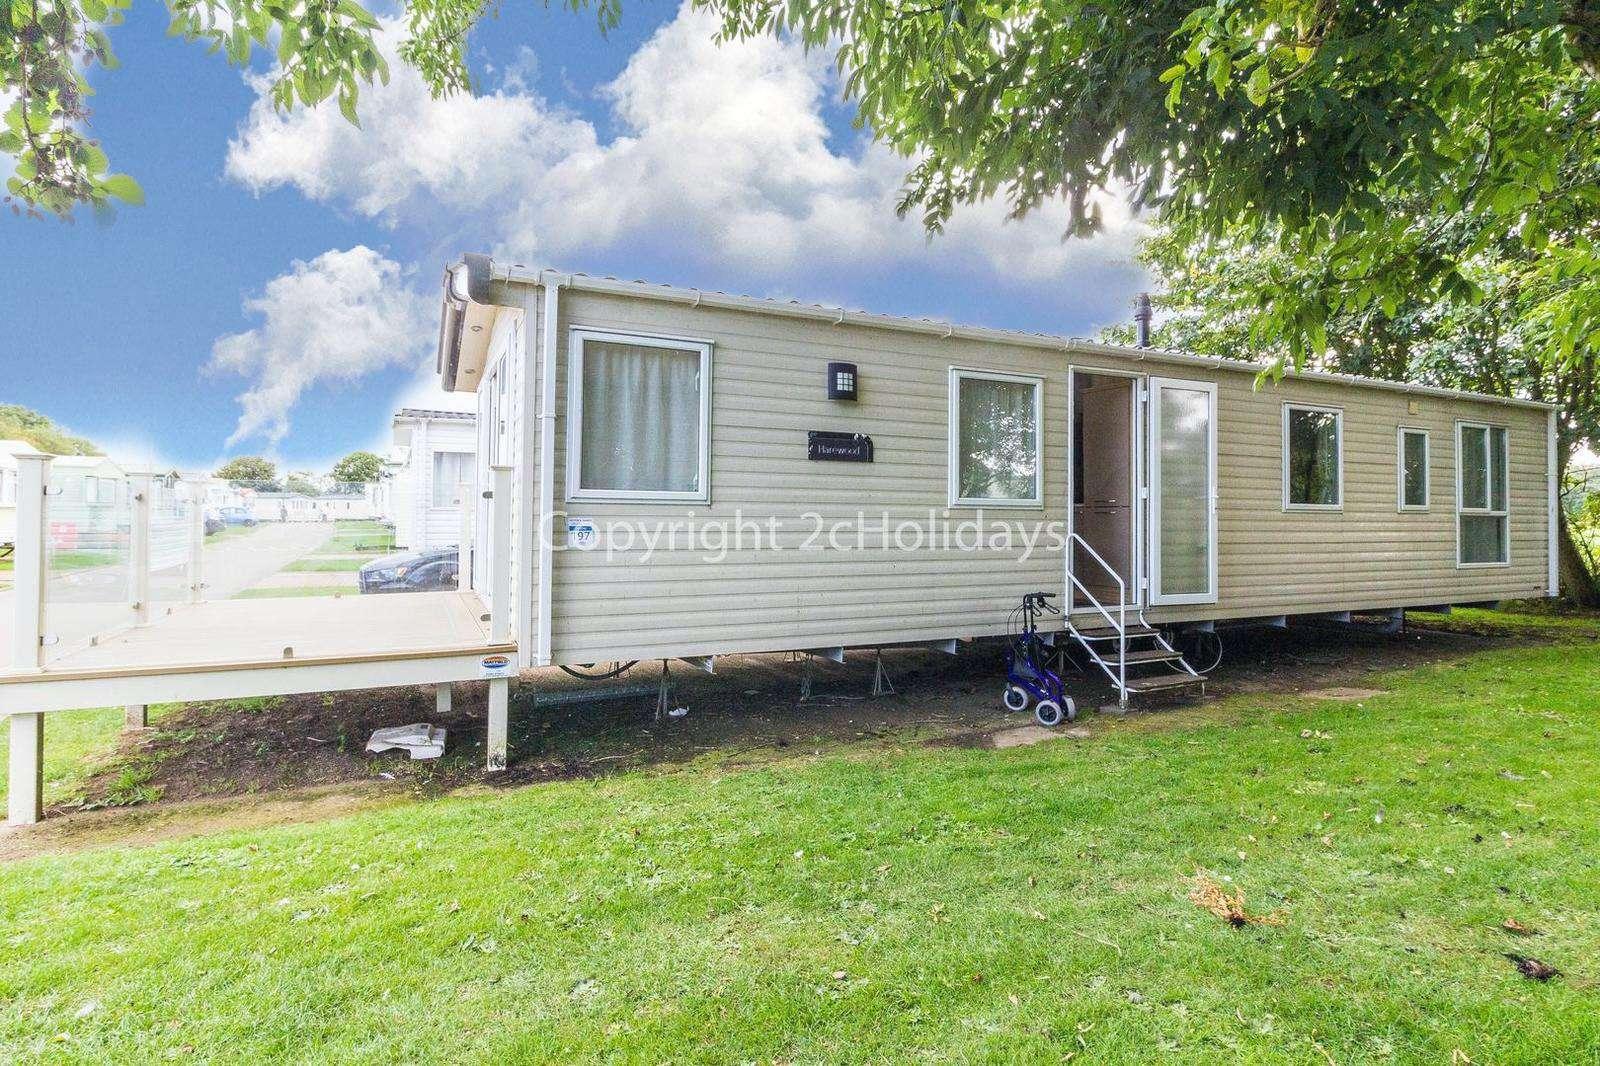 Superb 8 berth caravan on a fantastic family friendly holiday park! - property